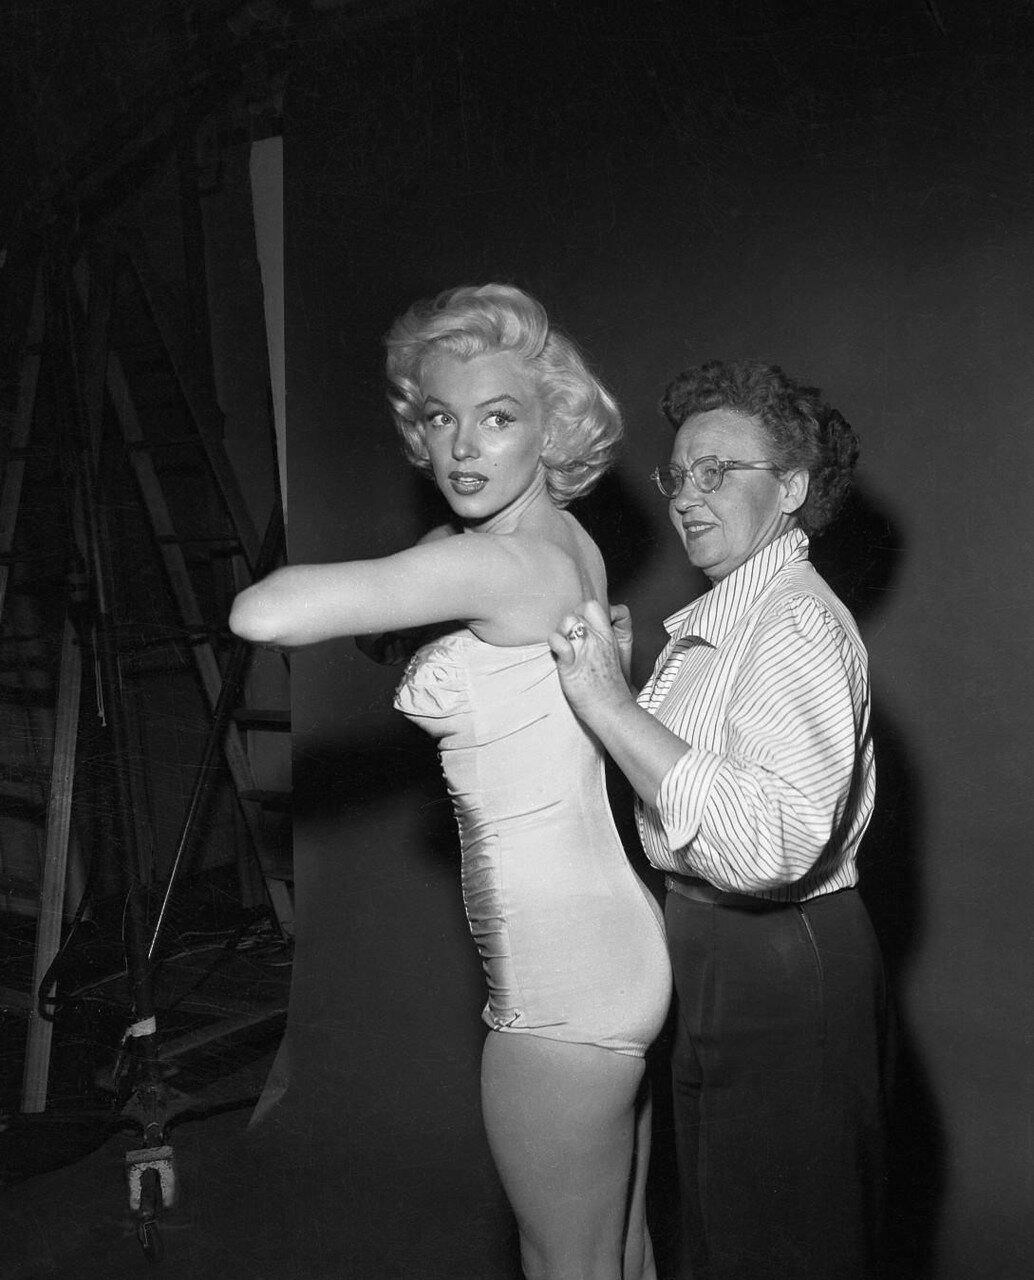 Marilyn Monroe Getting Help with Bathing Suit